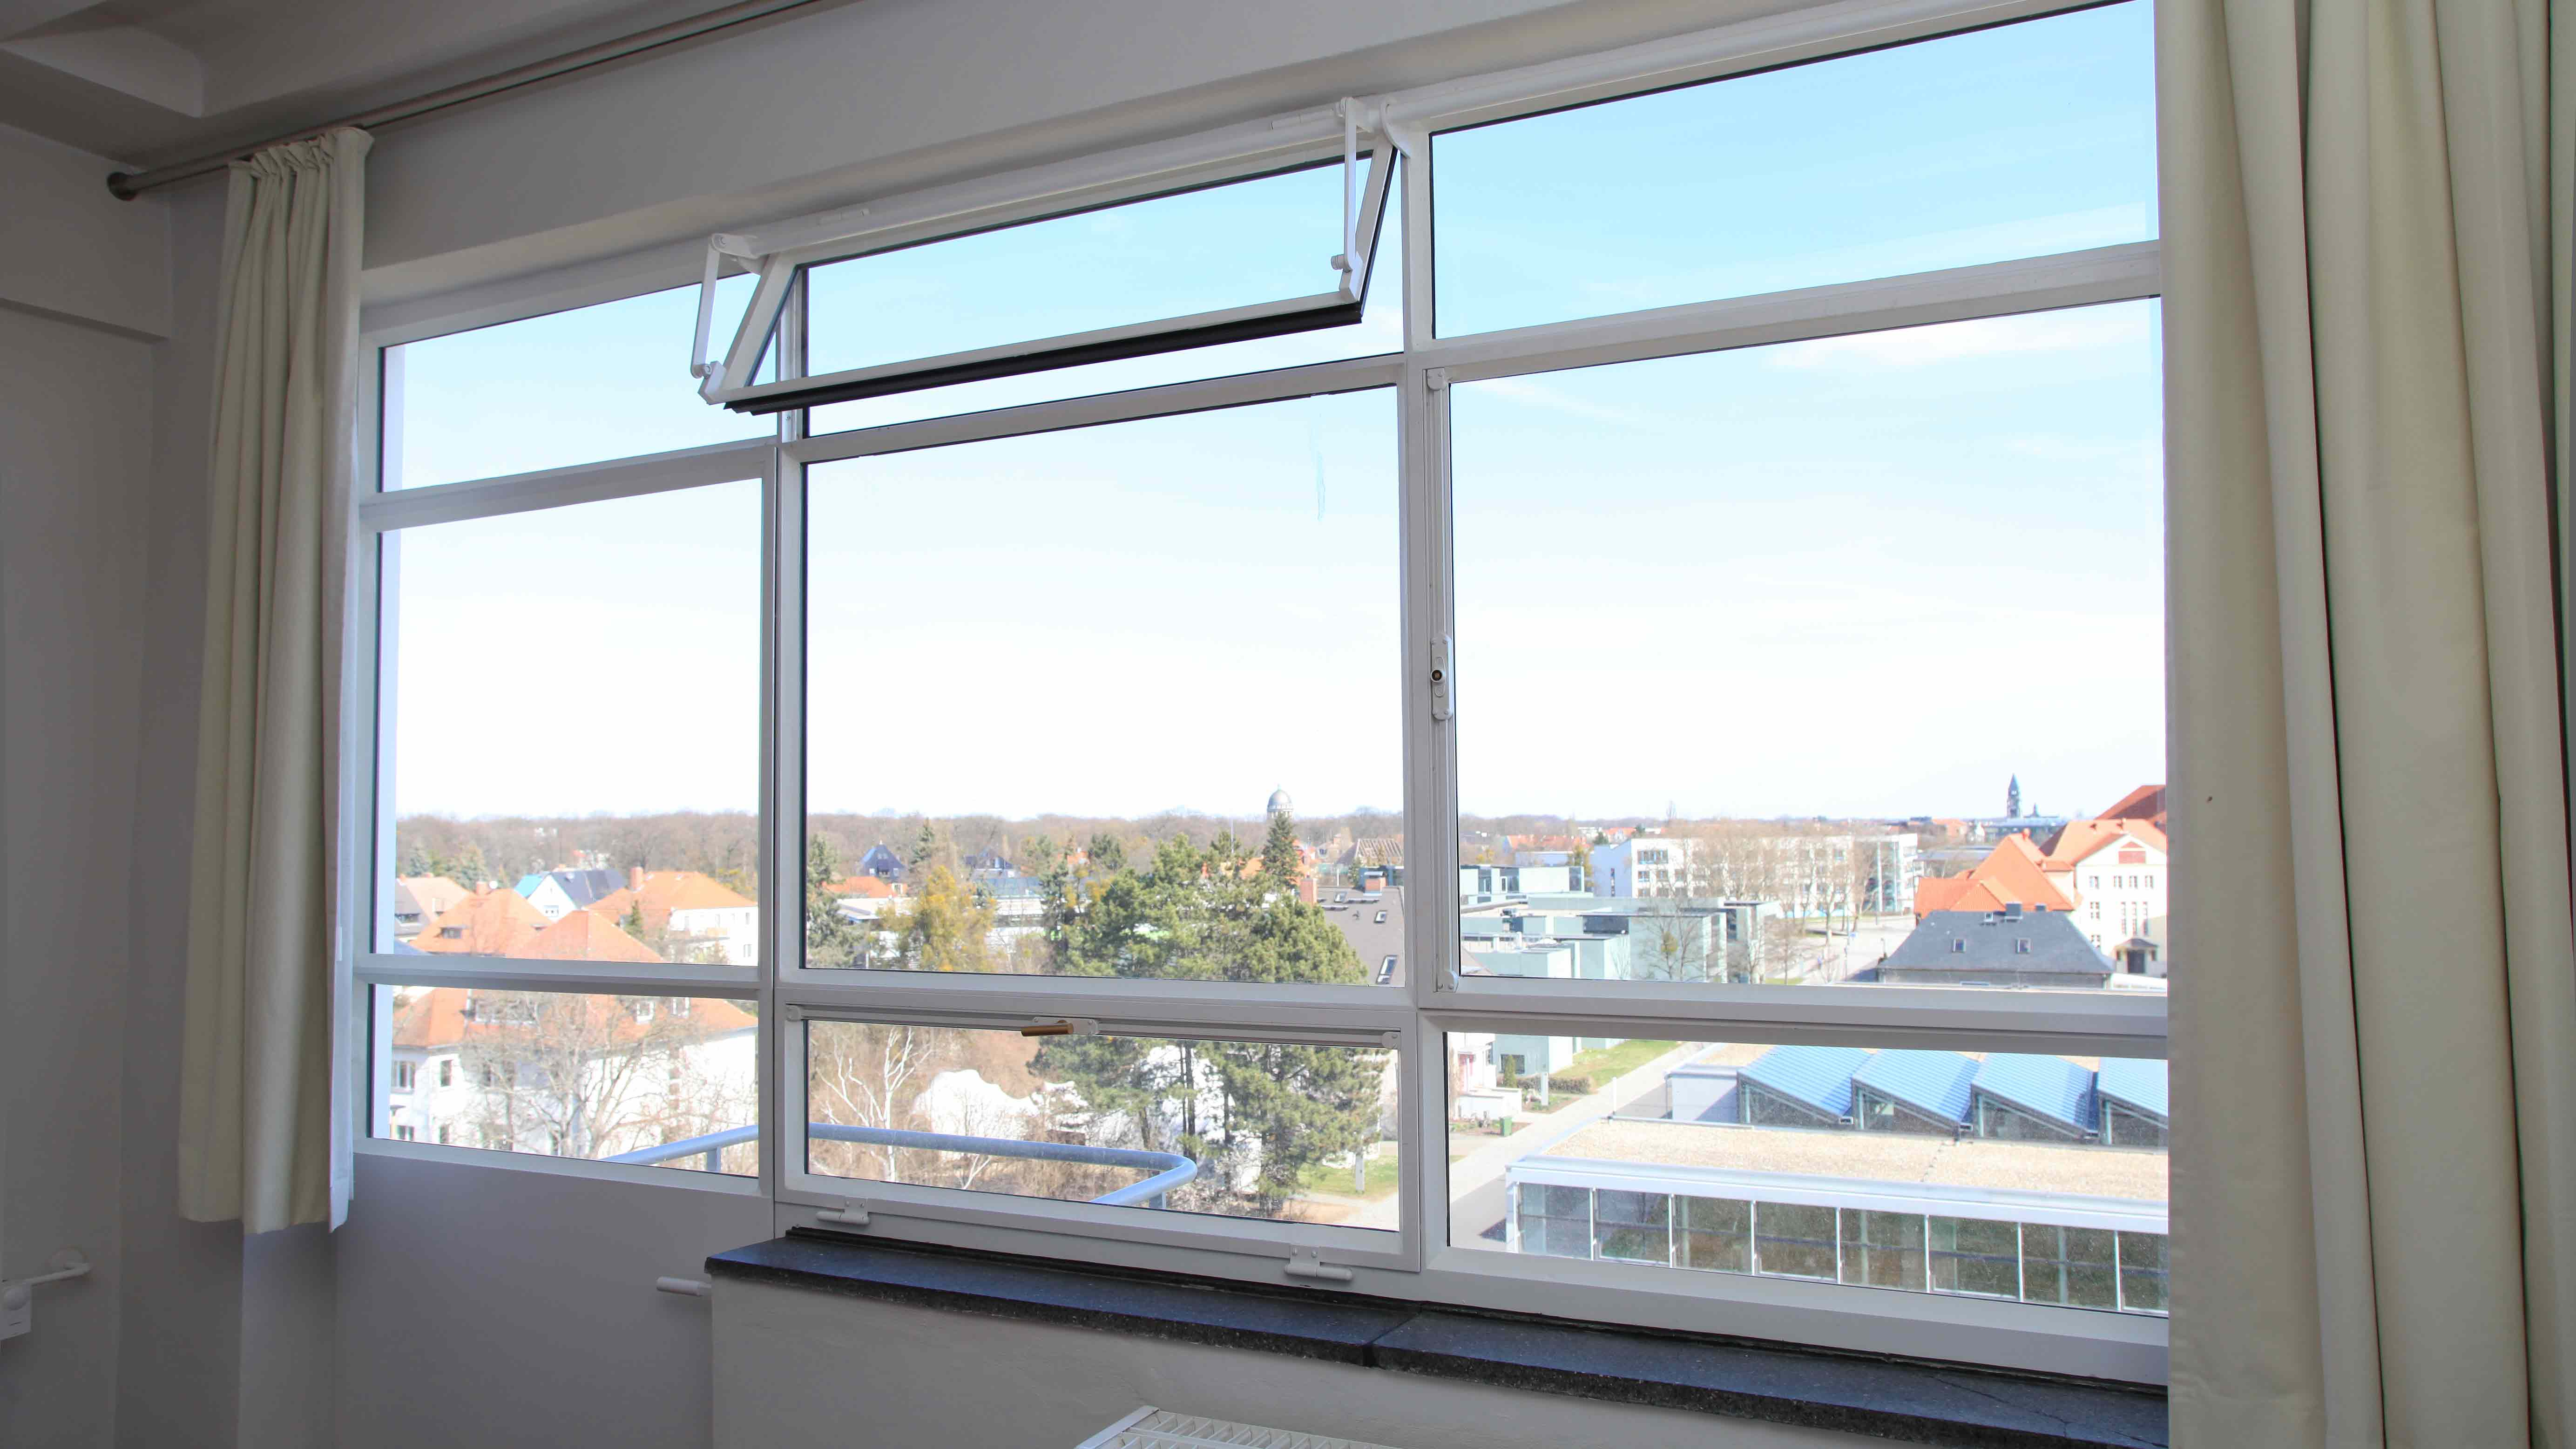 Bauhaus Dessau 3